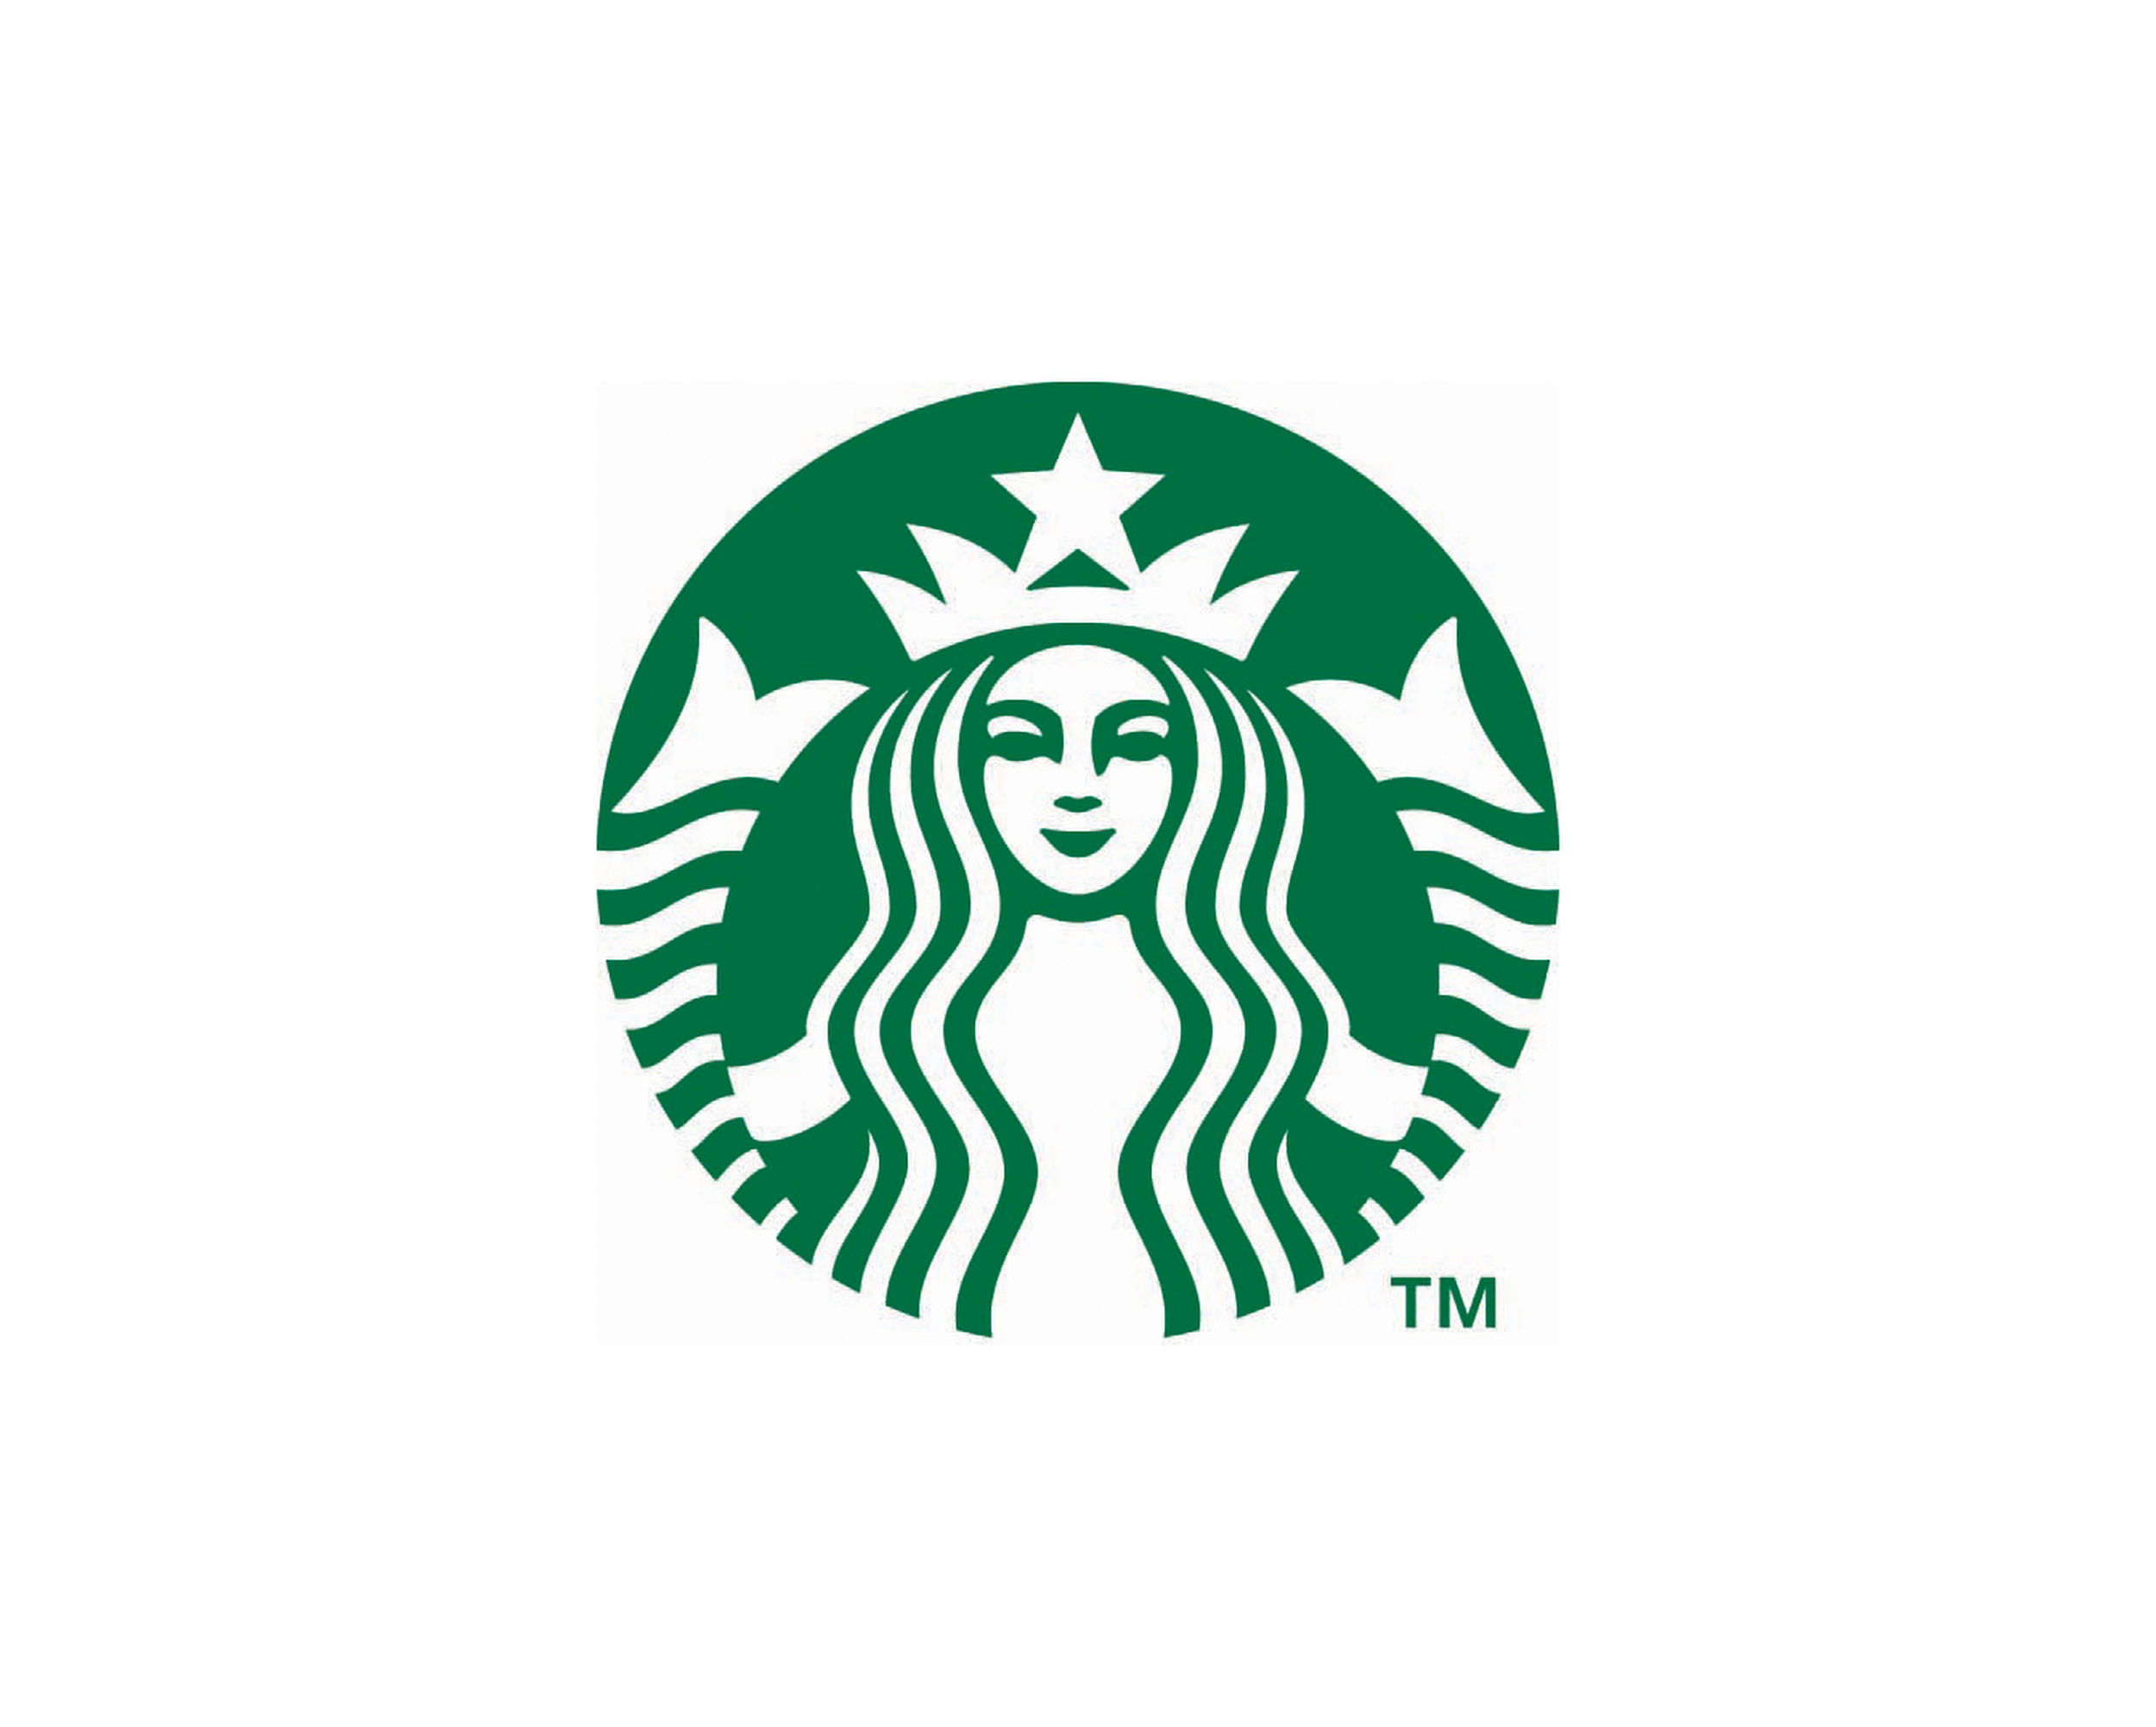 2f2985b5d46 Starbucks Stories - Stories to inspire and nurture the human spirit